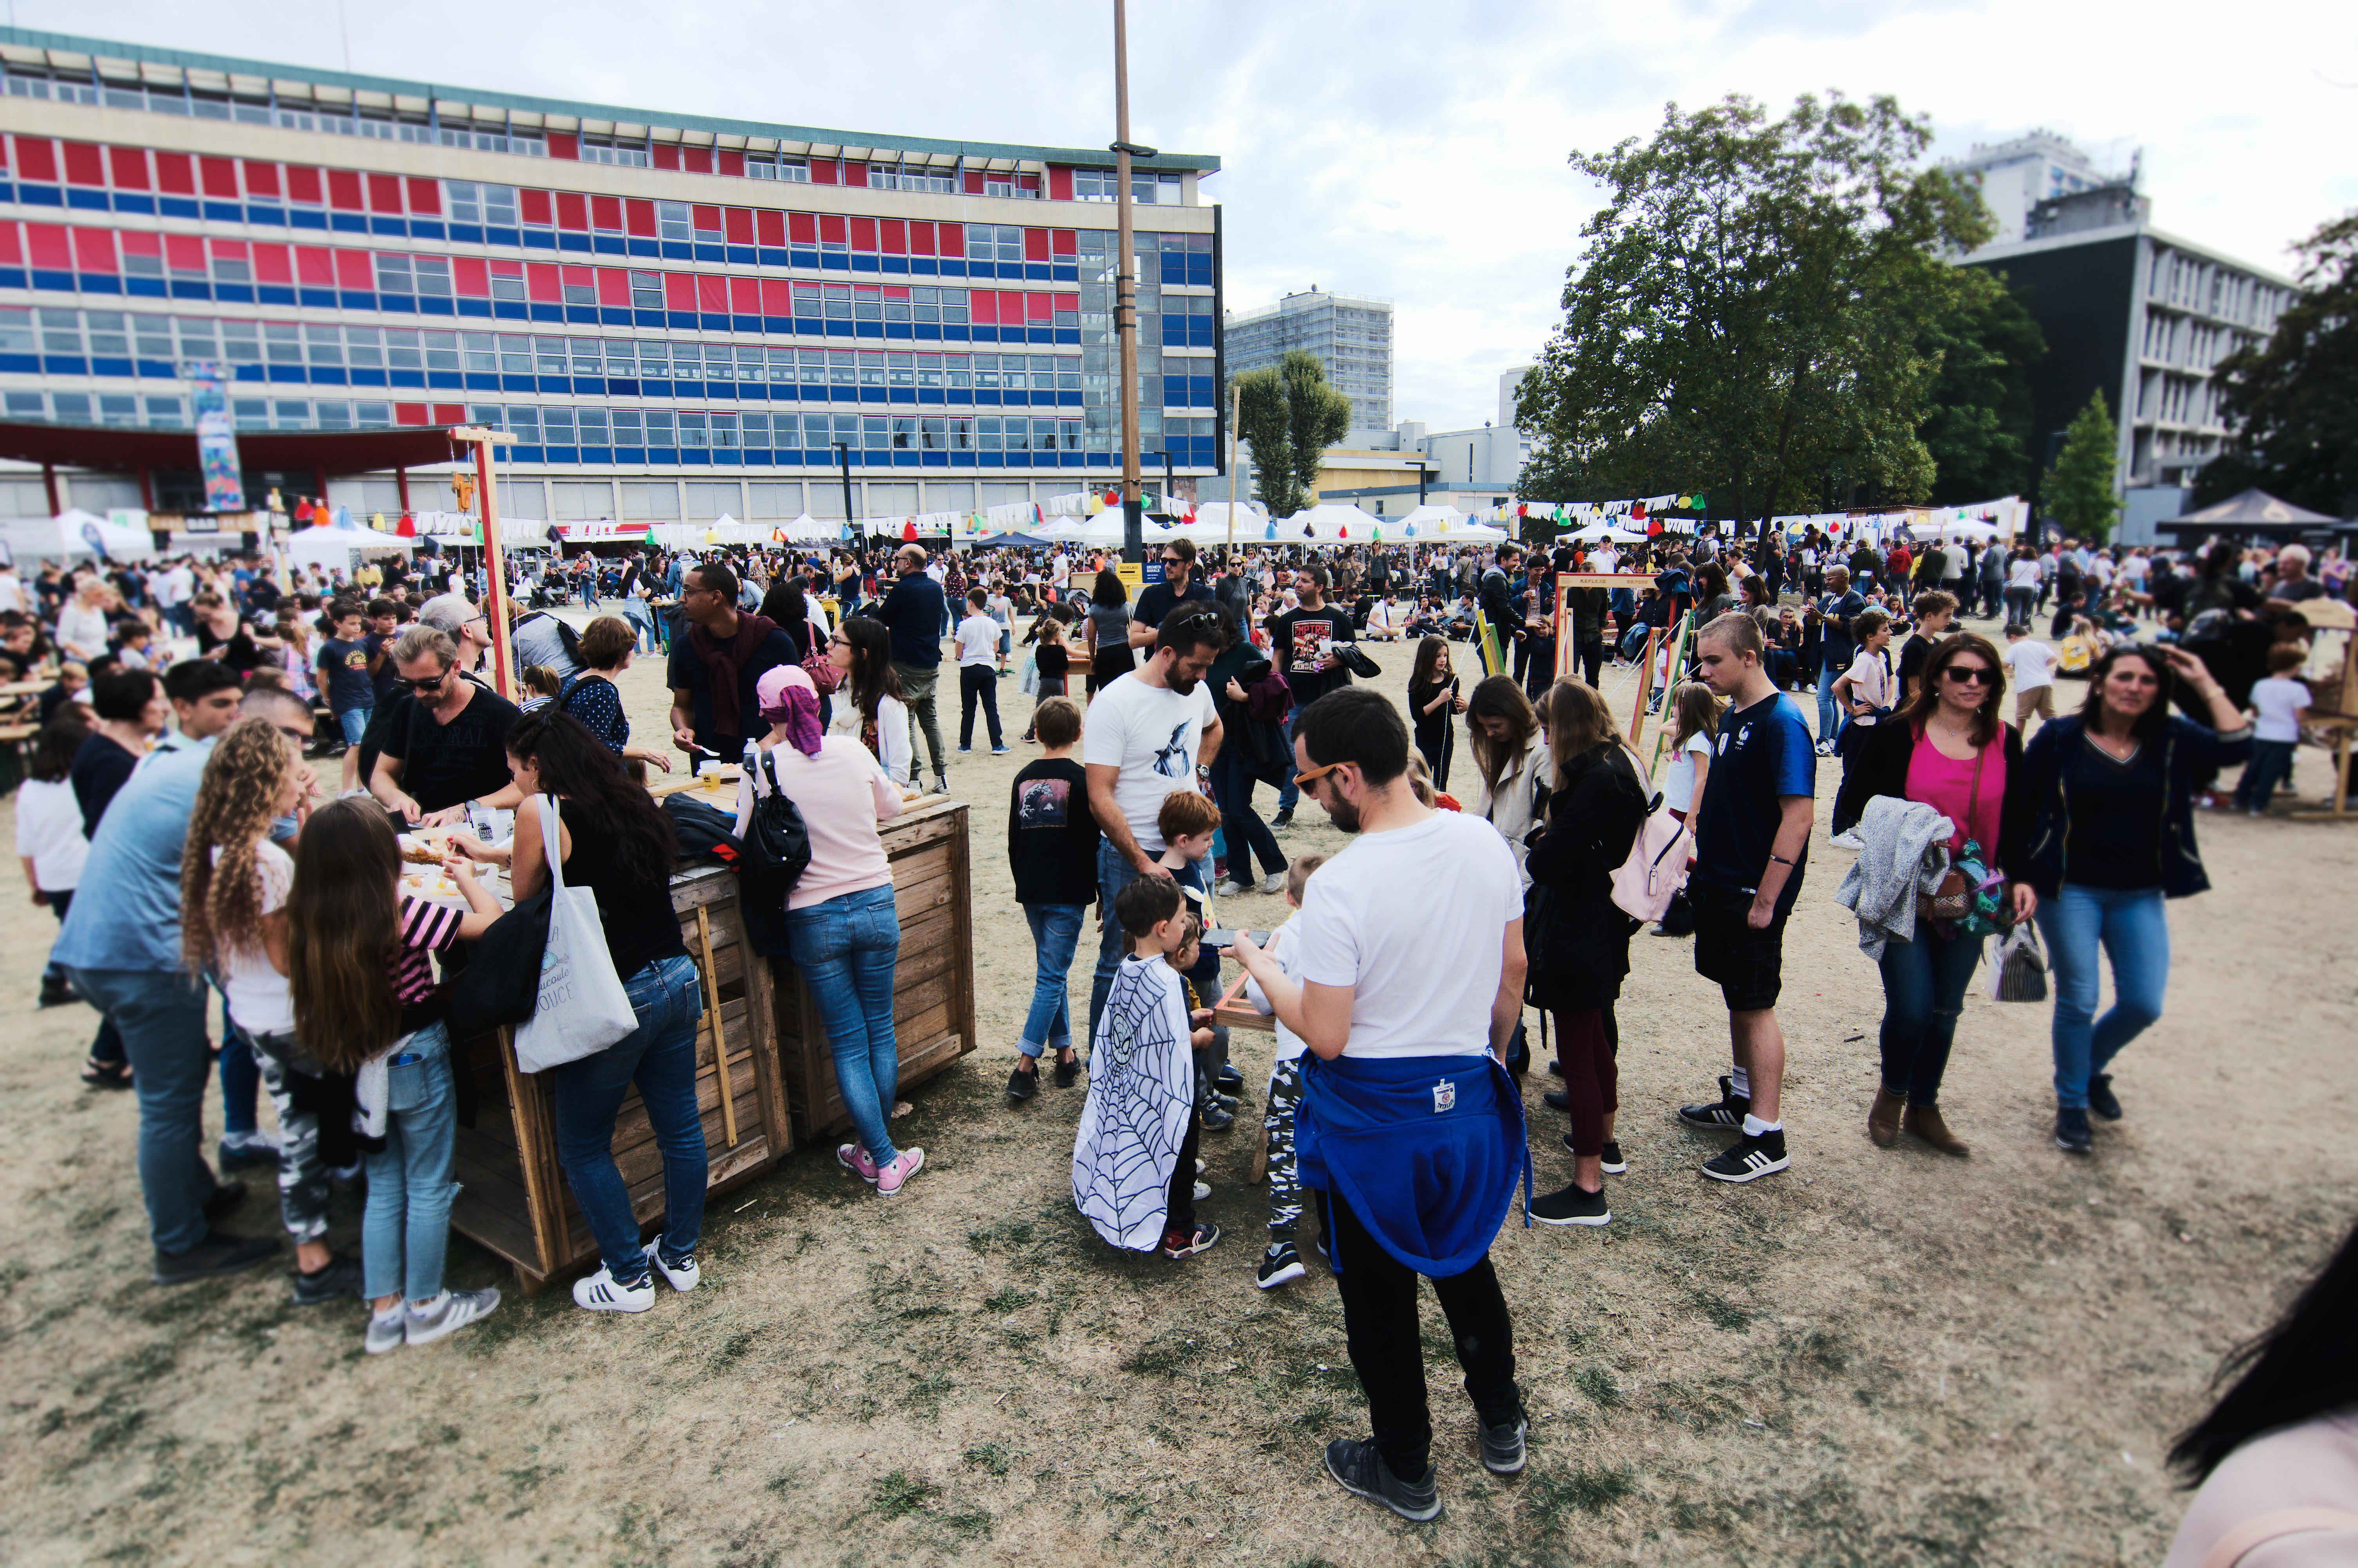 Street Bouche Festival 4 2019 Strasbourg street food90 - Street Bouche